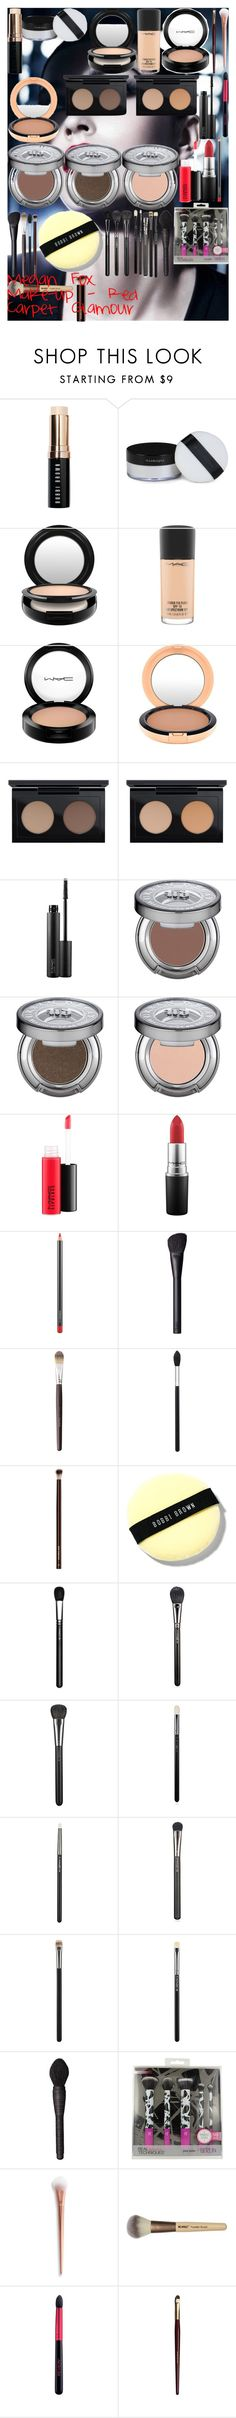 Megan Fox Make-up - Red Carpet Glamour by oroartye-1 on Polyvore featuring beauty, NARS Cosmetics, Bobbi Brown Cosmetics, MAC Cosmetics, Illamasqua, Louise Young Cosmetics, Urban Decay, Revlon, Morphe and Giorgio Armani